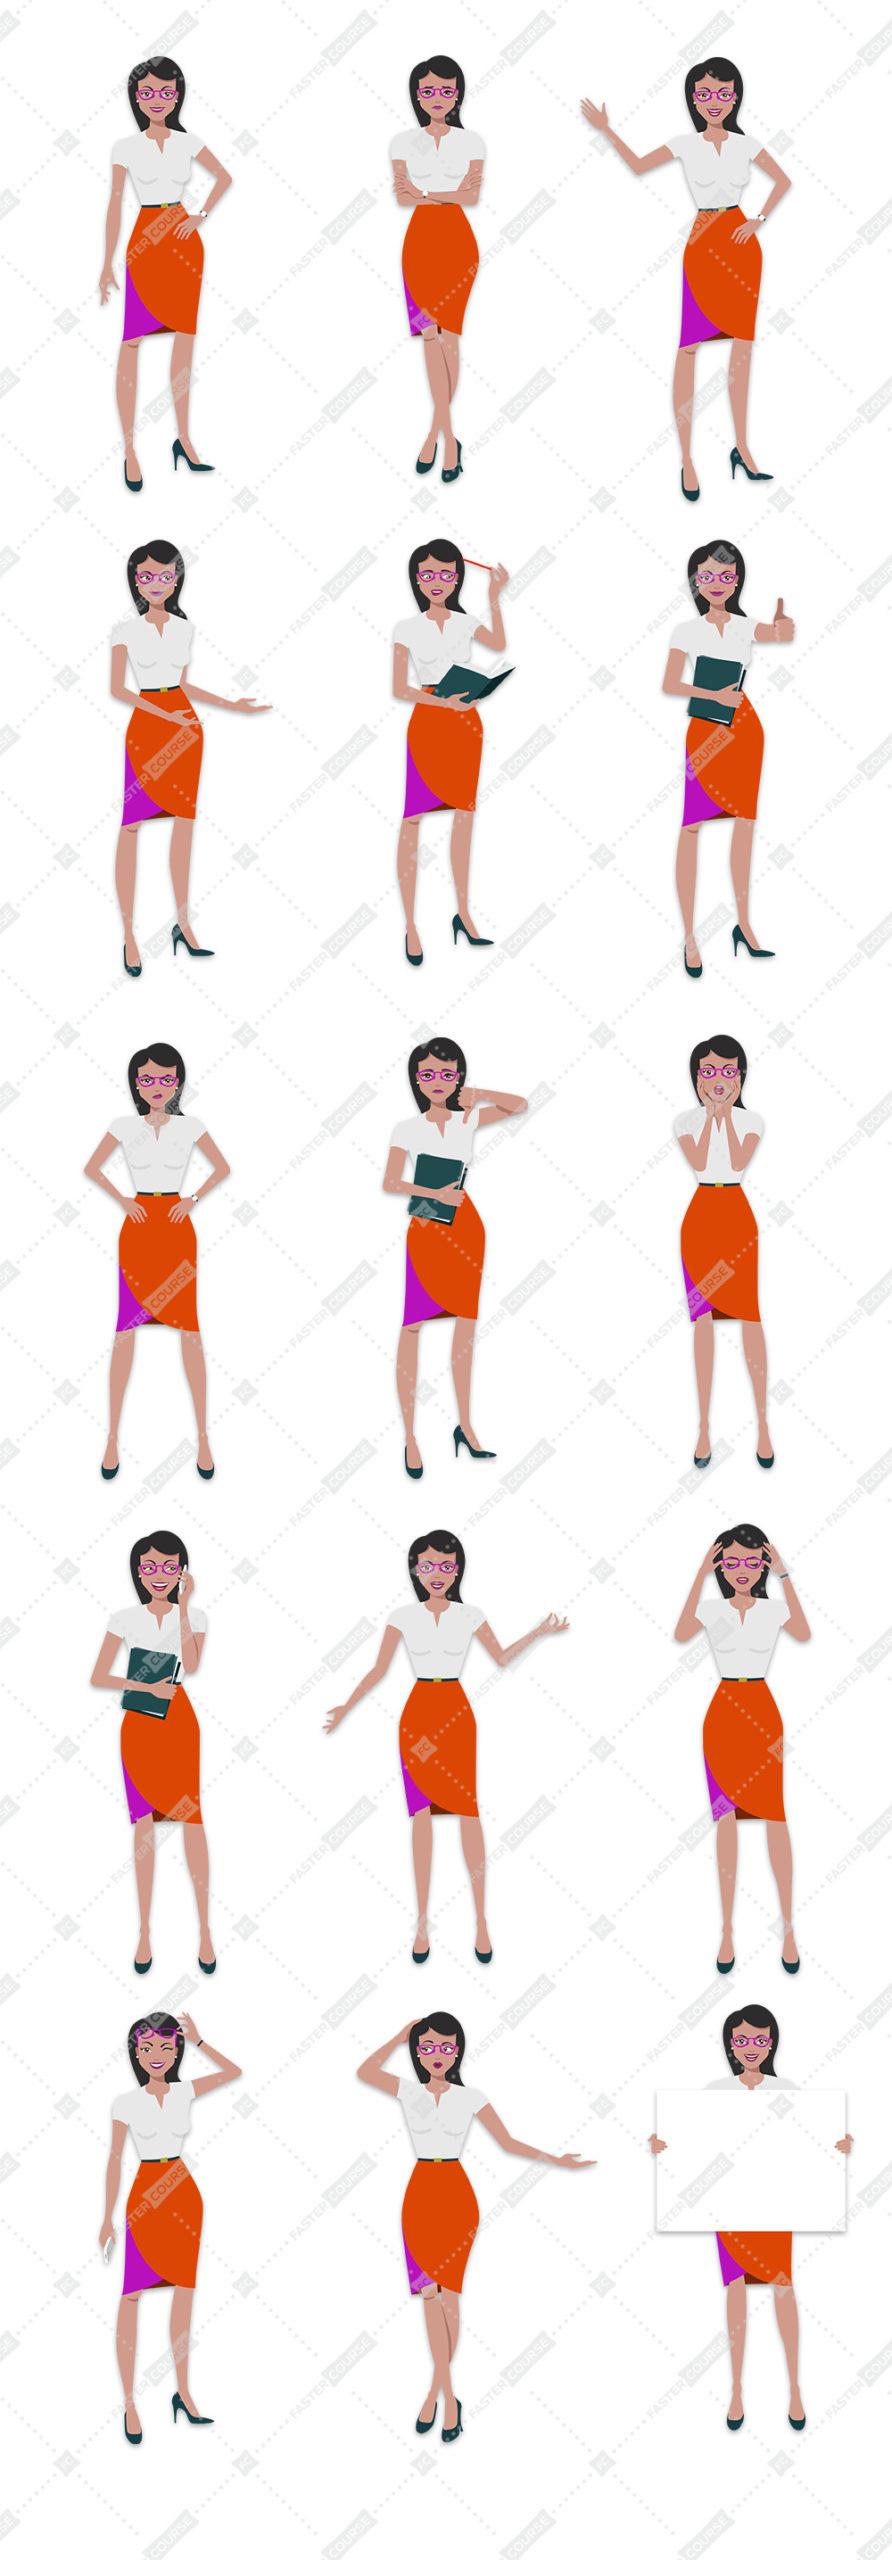 characters_teresa_all_poses